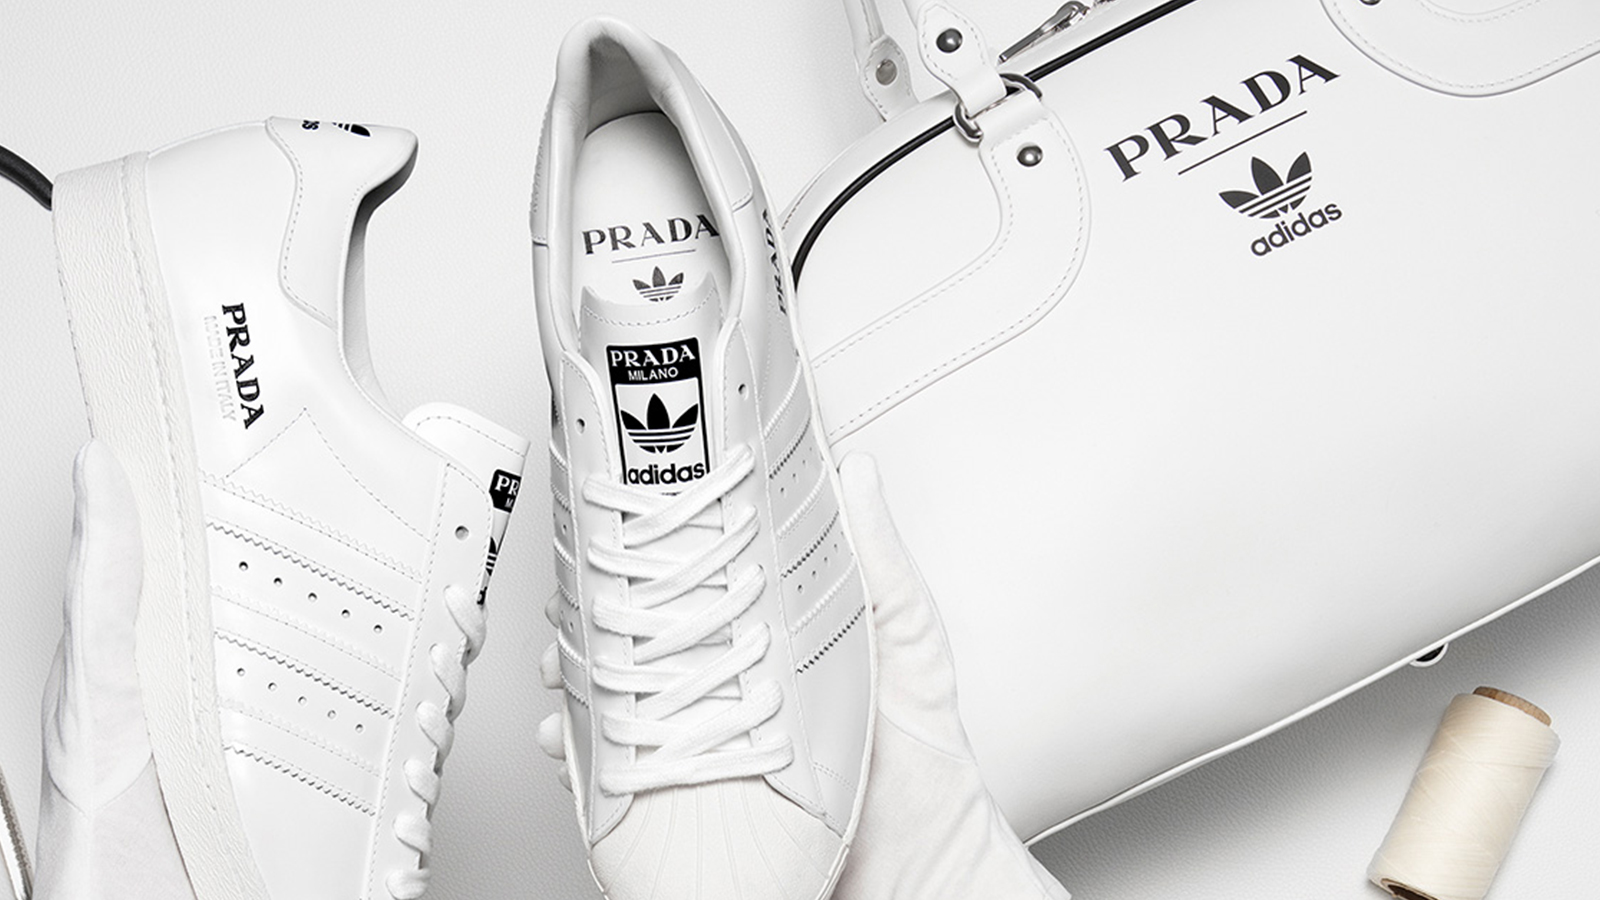 reposo crisantemo doce  Prada for adidas Limited Edition - IMBOLDN